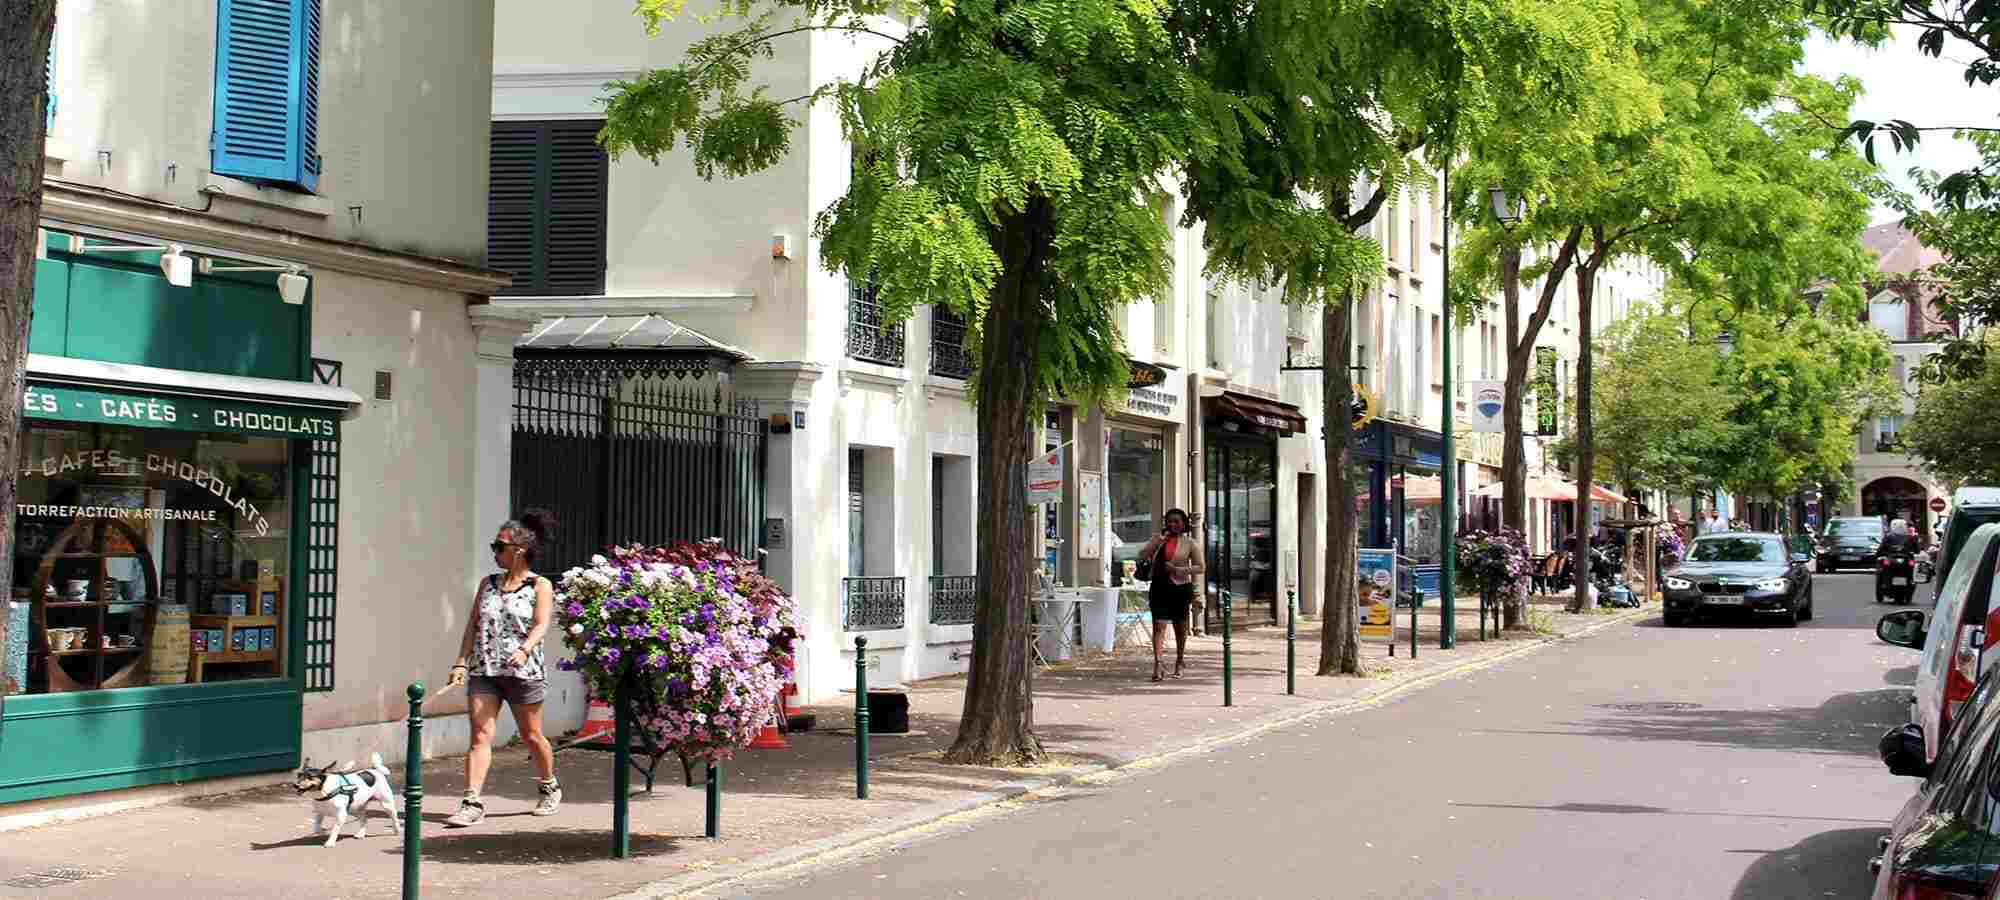 fenetres-Rueil-Mailmaison